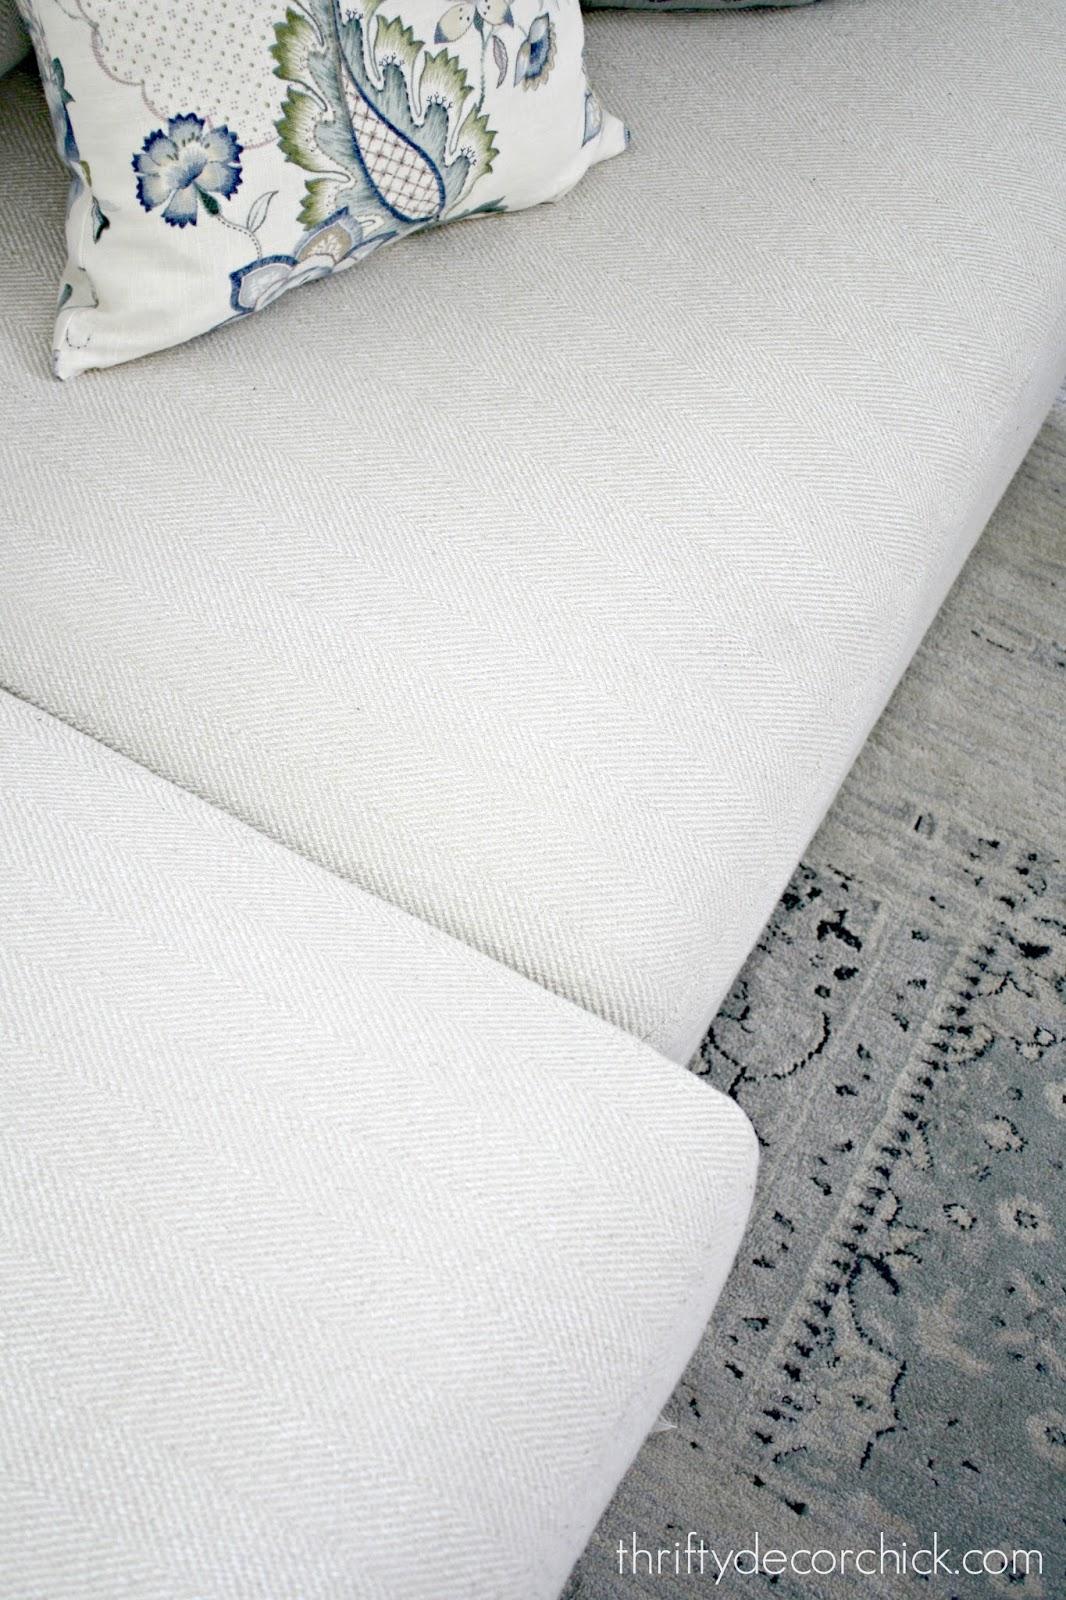 Simple trick for sliding sofa cushions